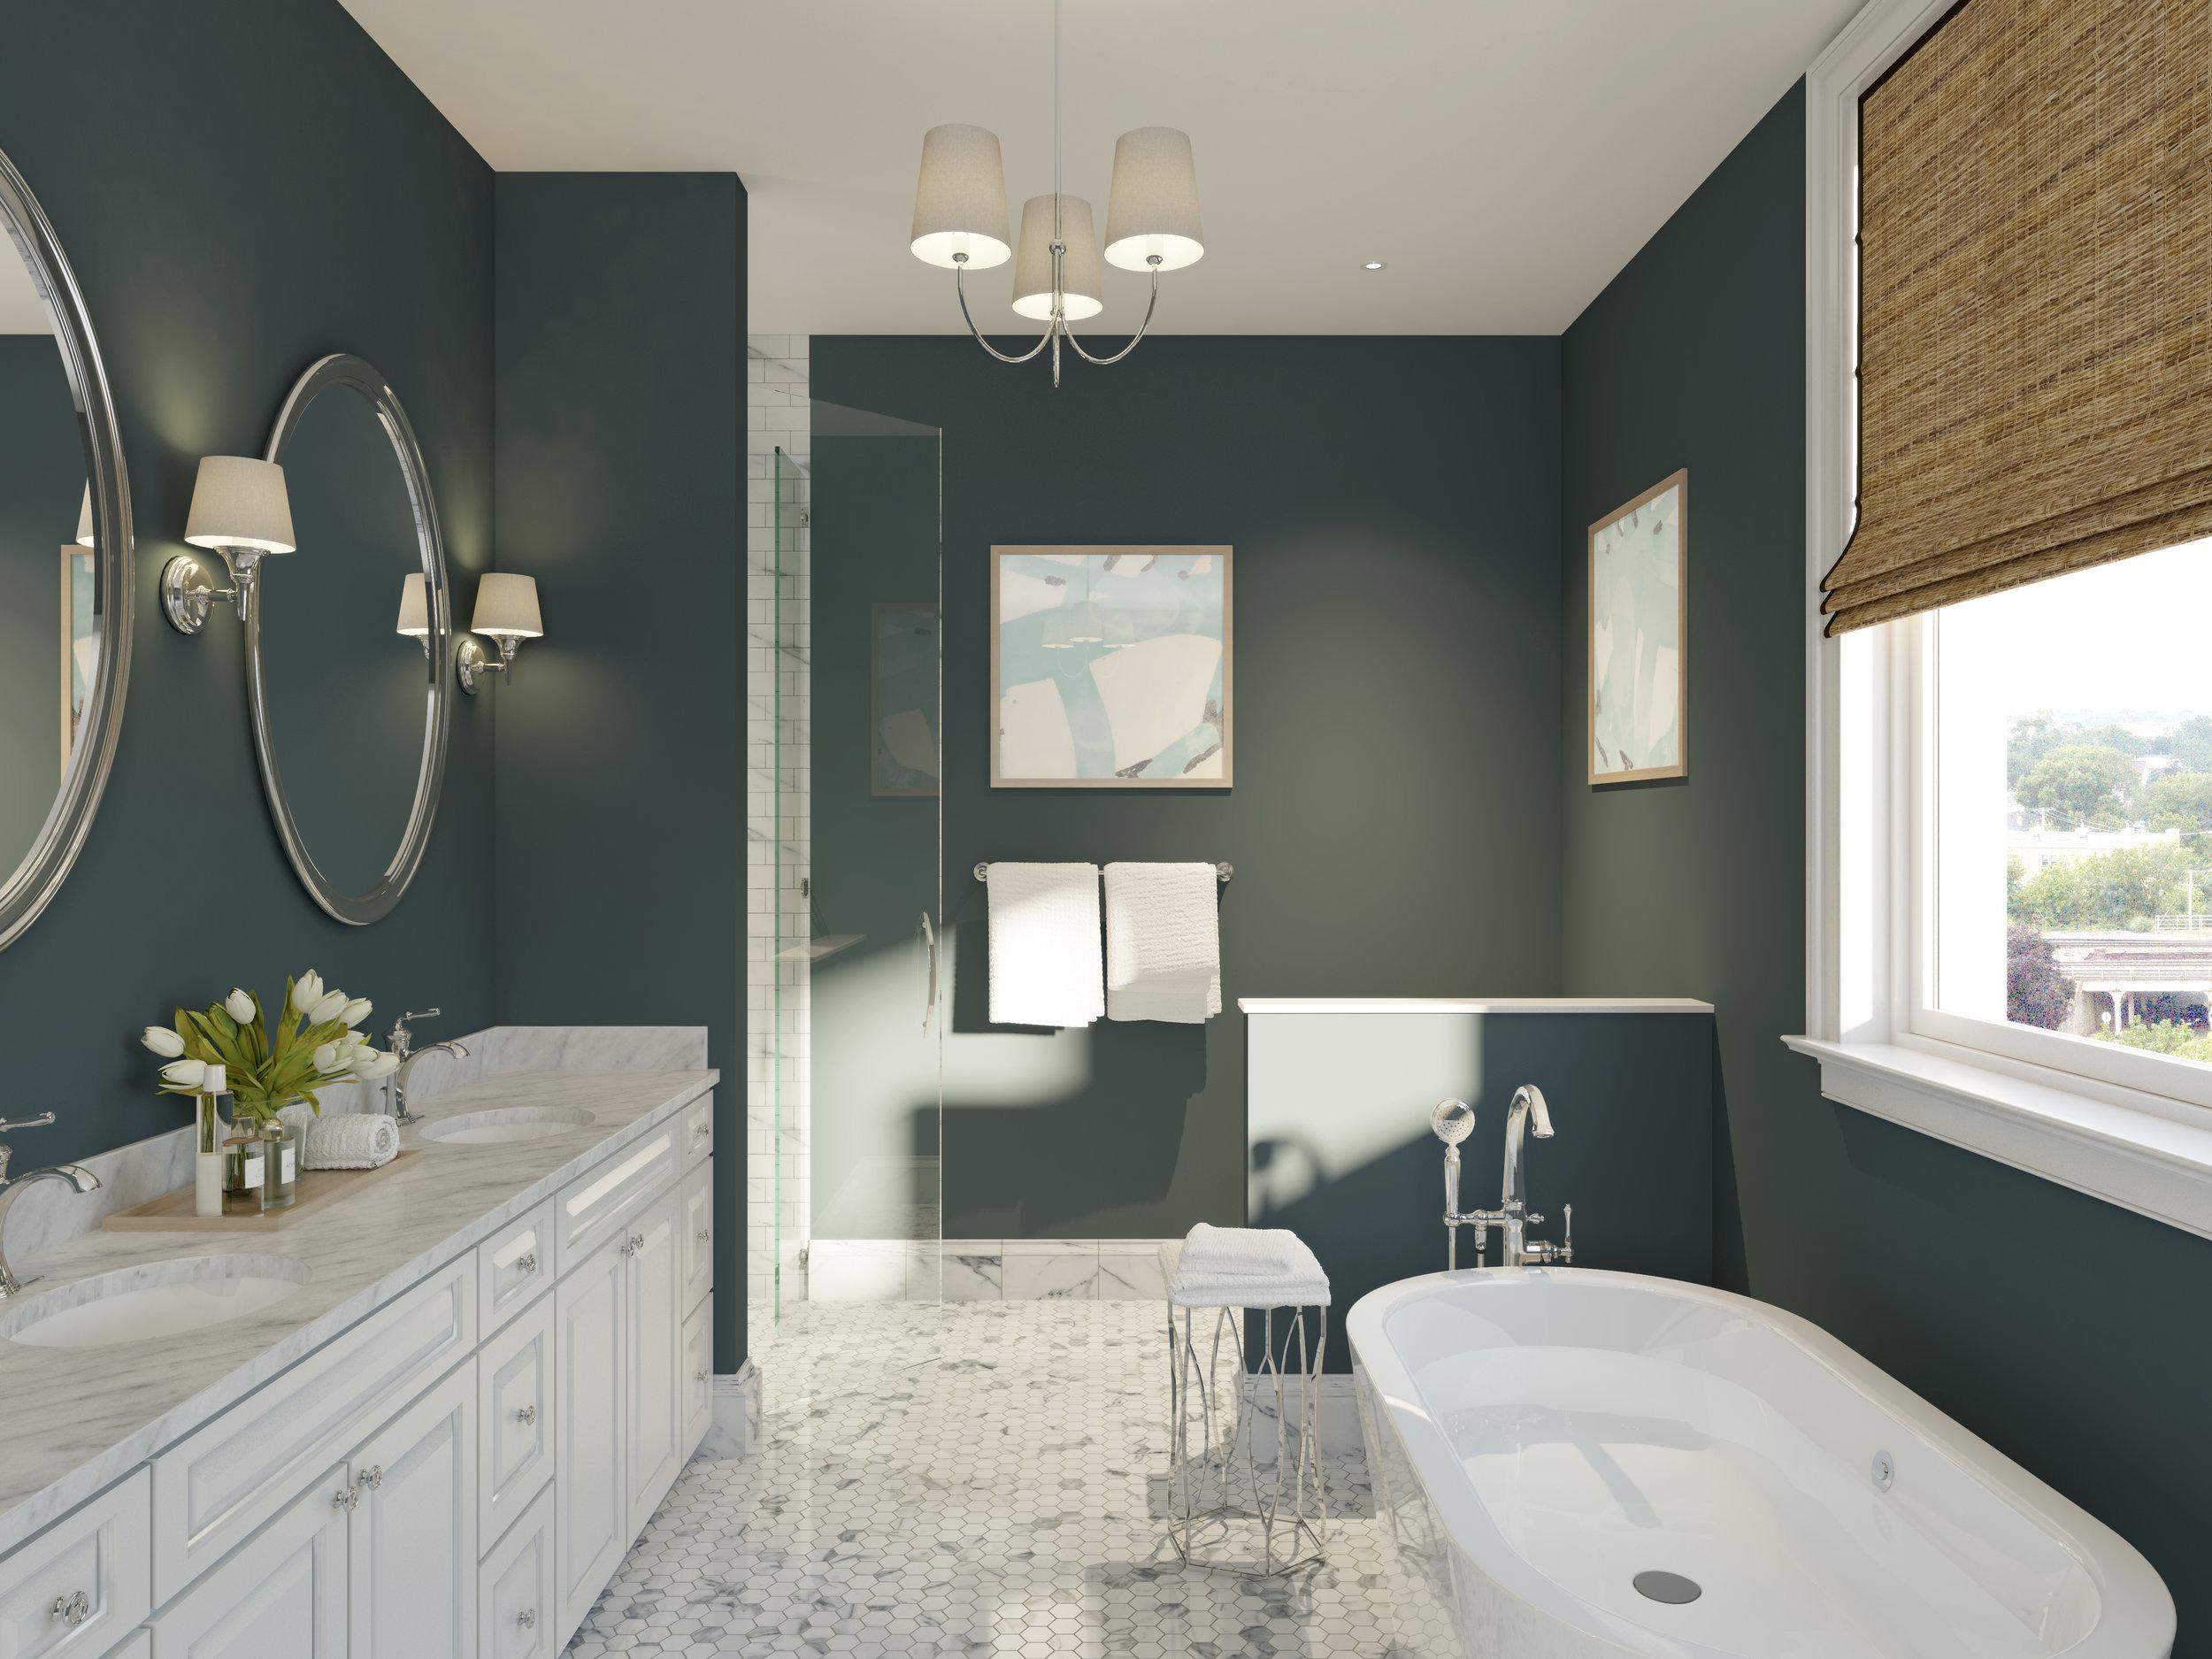 1701_Bathroom_Final.jpg